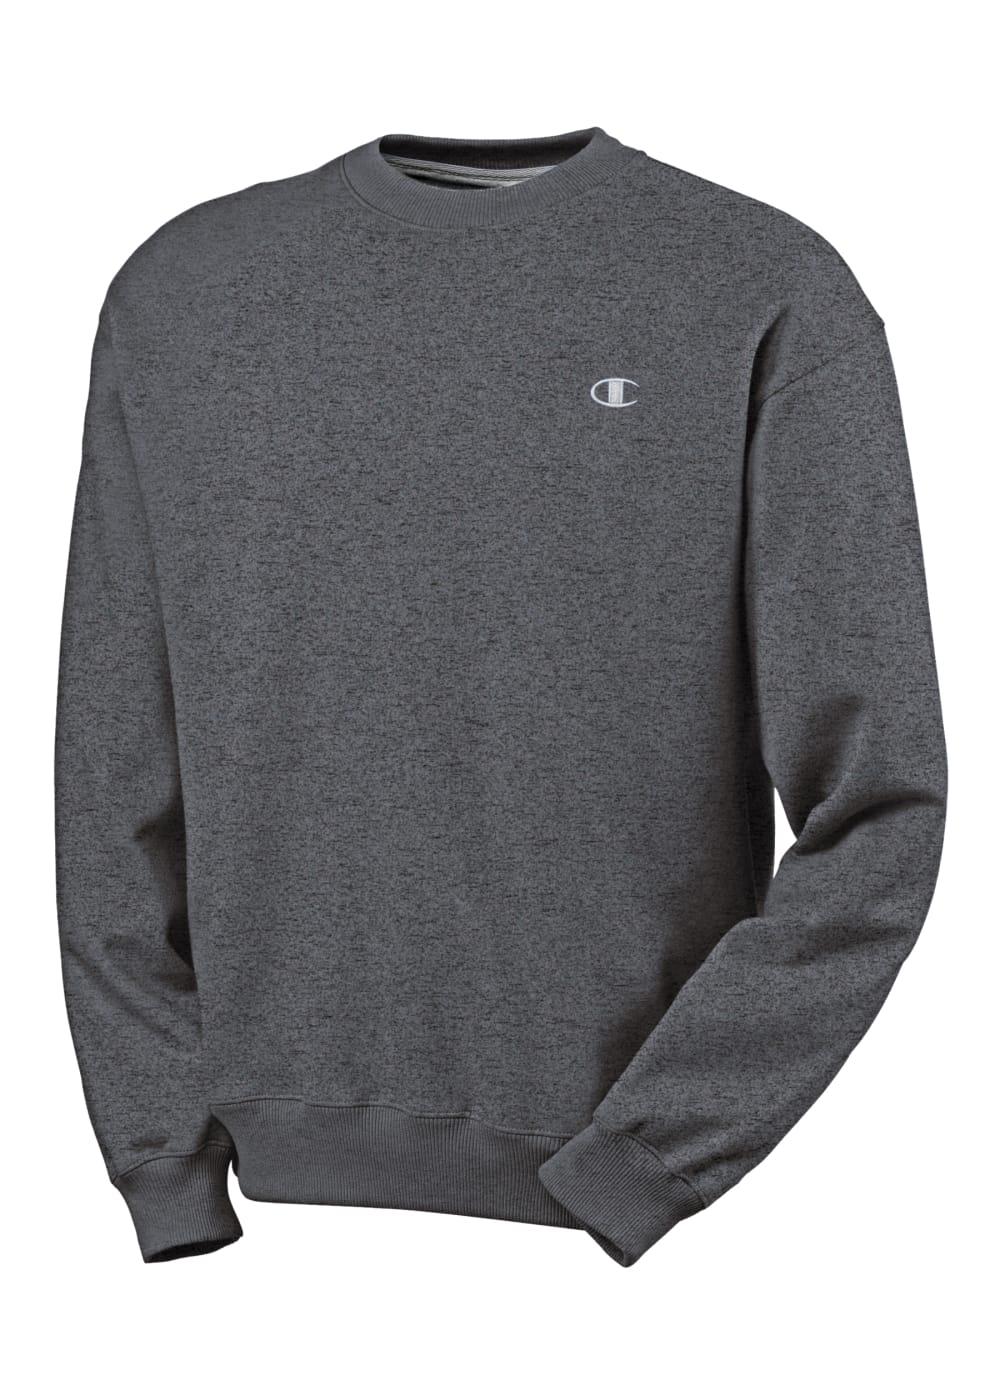 CHAMPION Men's Eco Fleece Crew Neck Sweatshirt - GRANITE HEATHER-G61